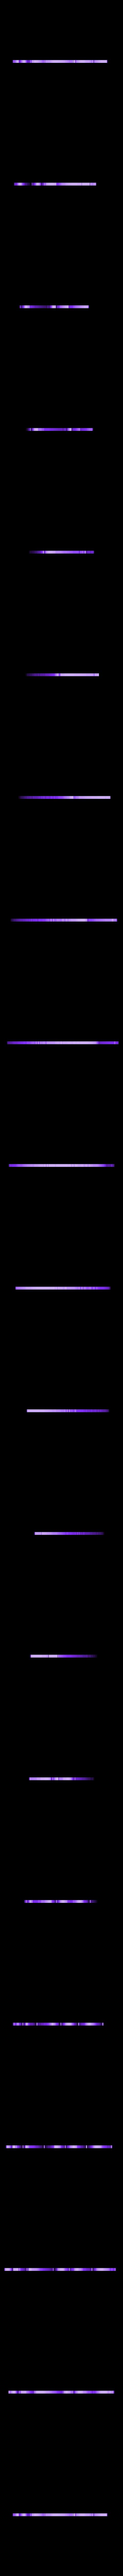 Bat wing Laces Right.stl Download free STL file Lace Up Bat Wings • 3D print design, amiedd